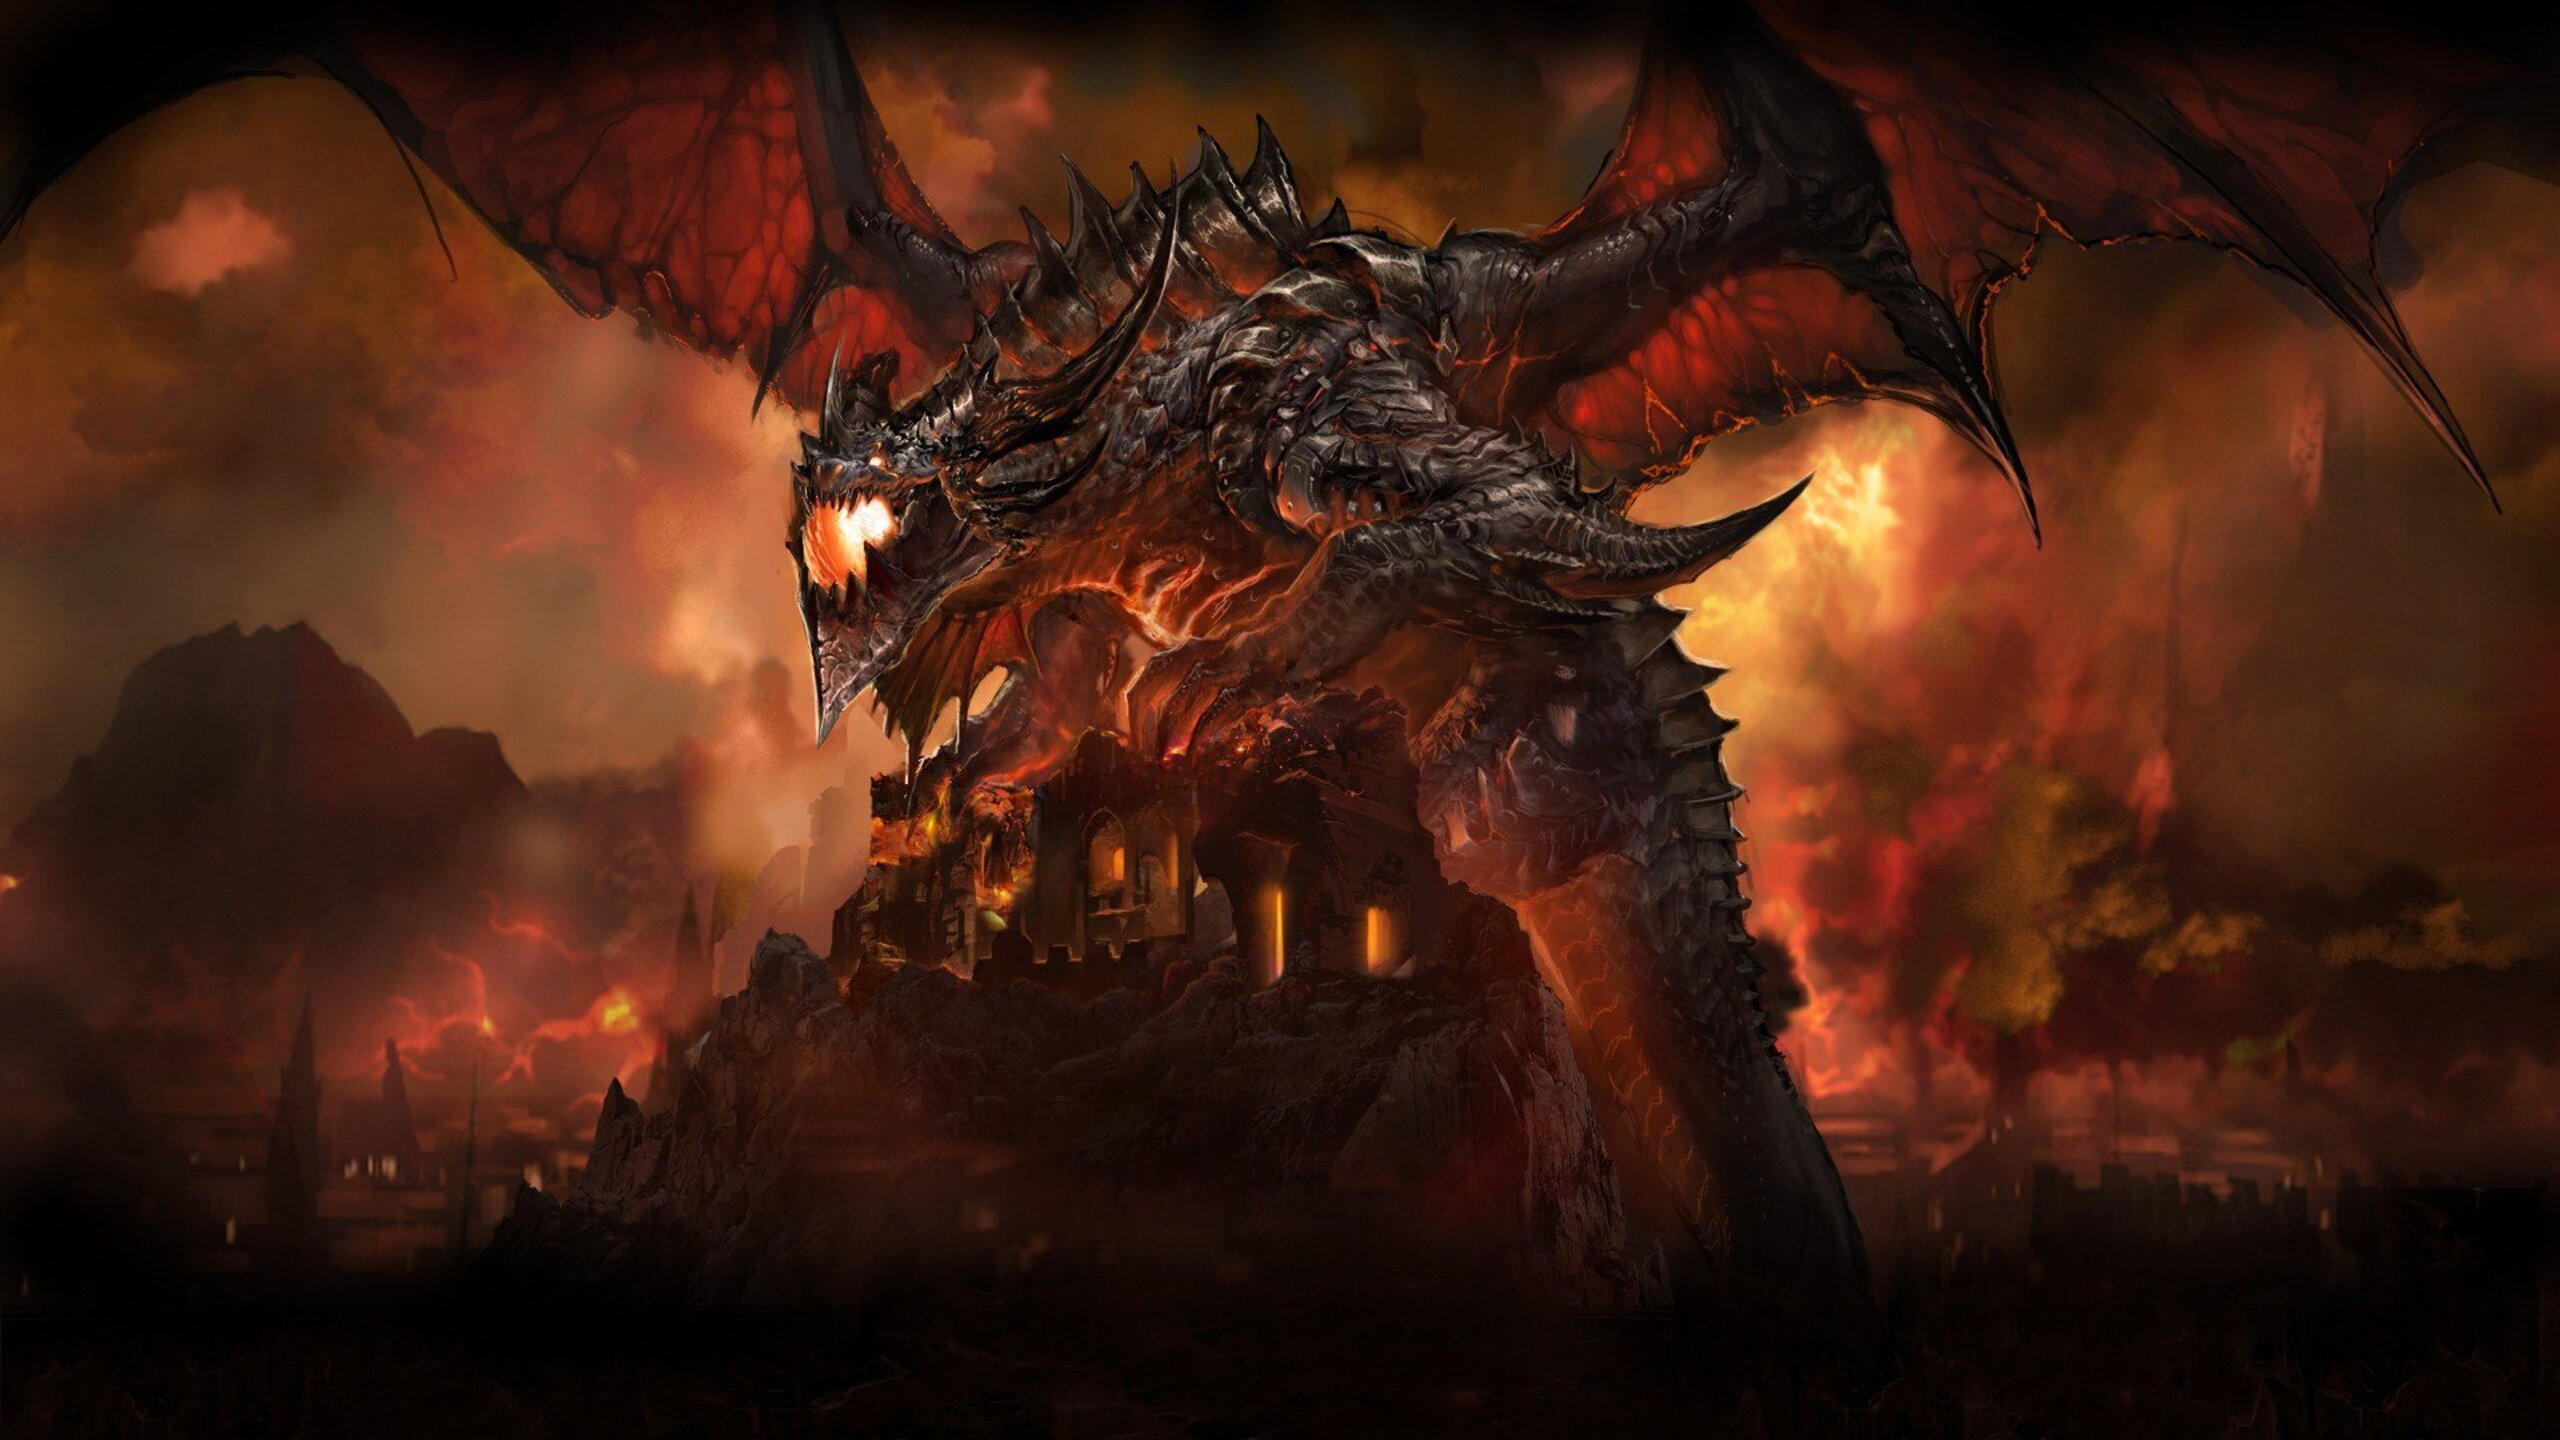 2560x1440 World Of Warcraft Dragon 1440P Resolution HD 4k ...